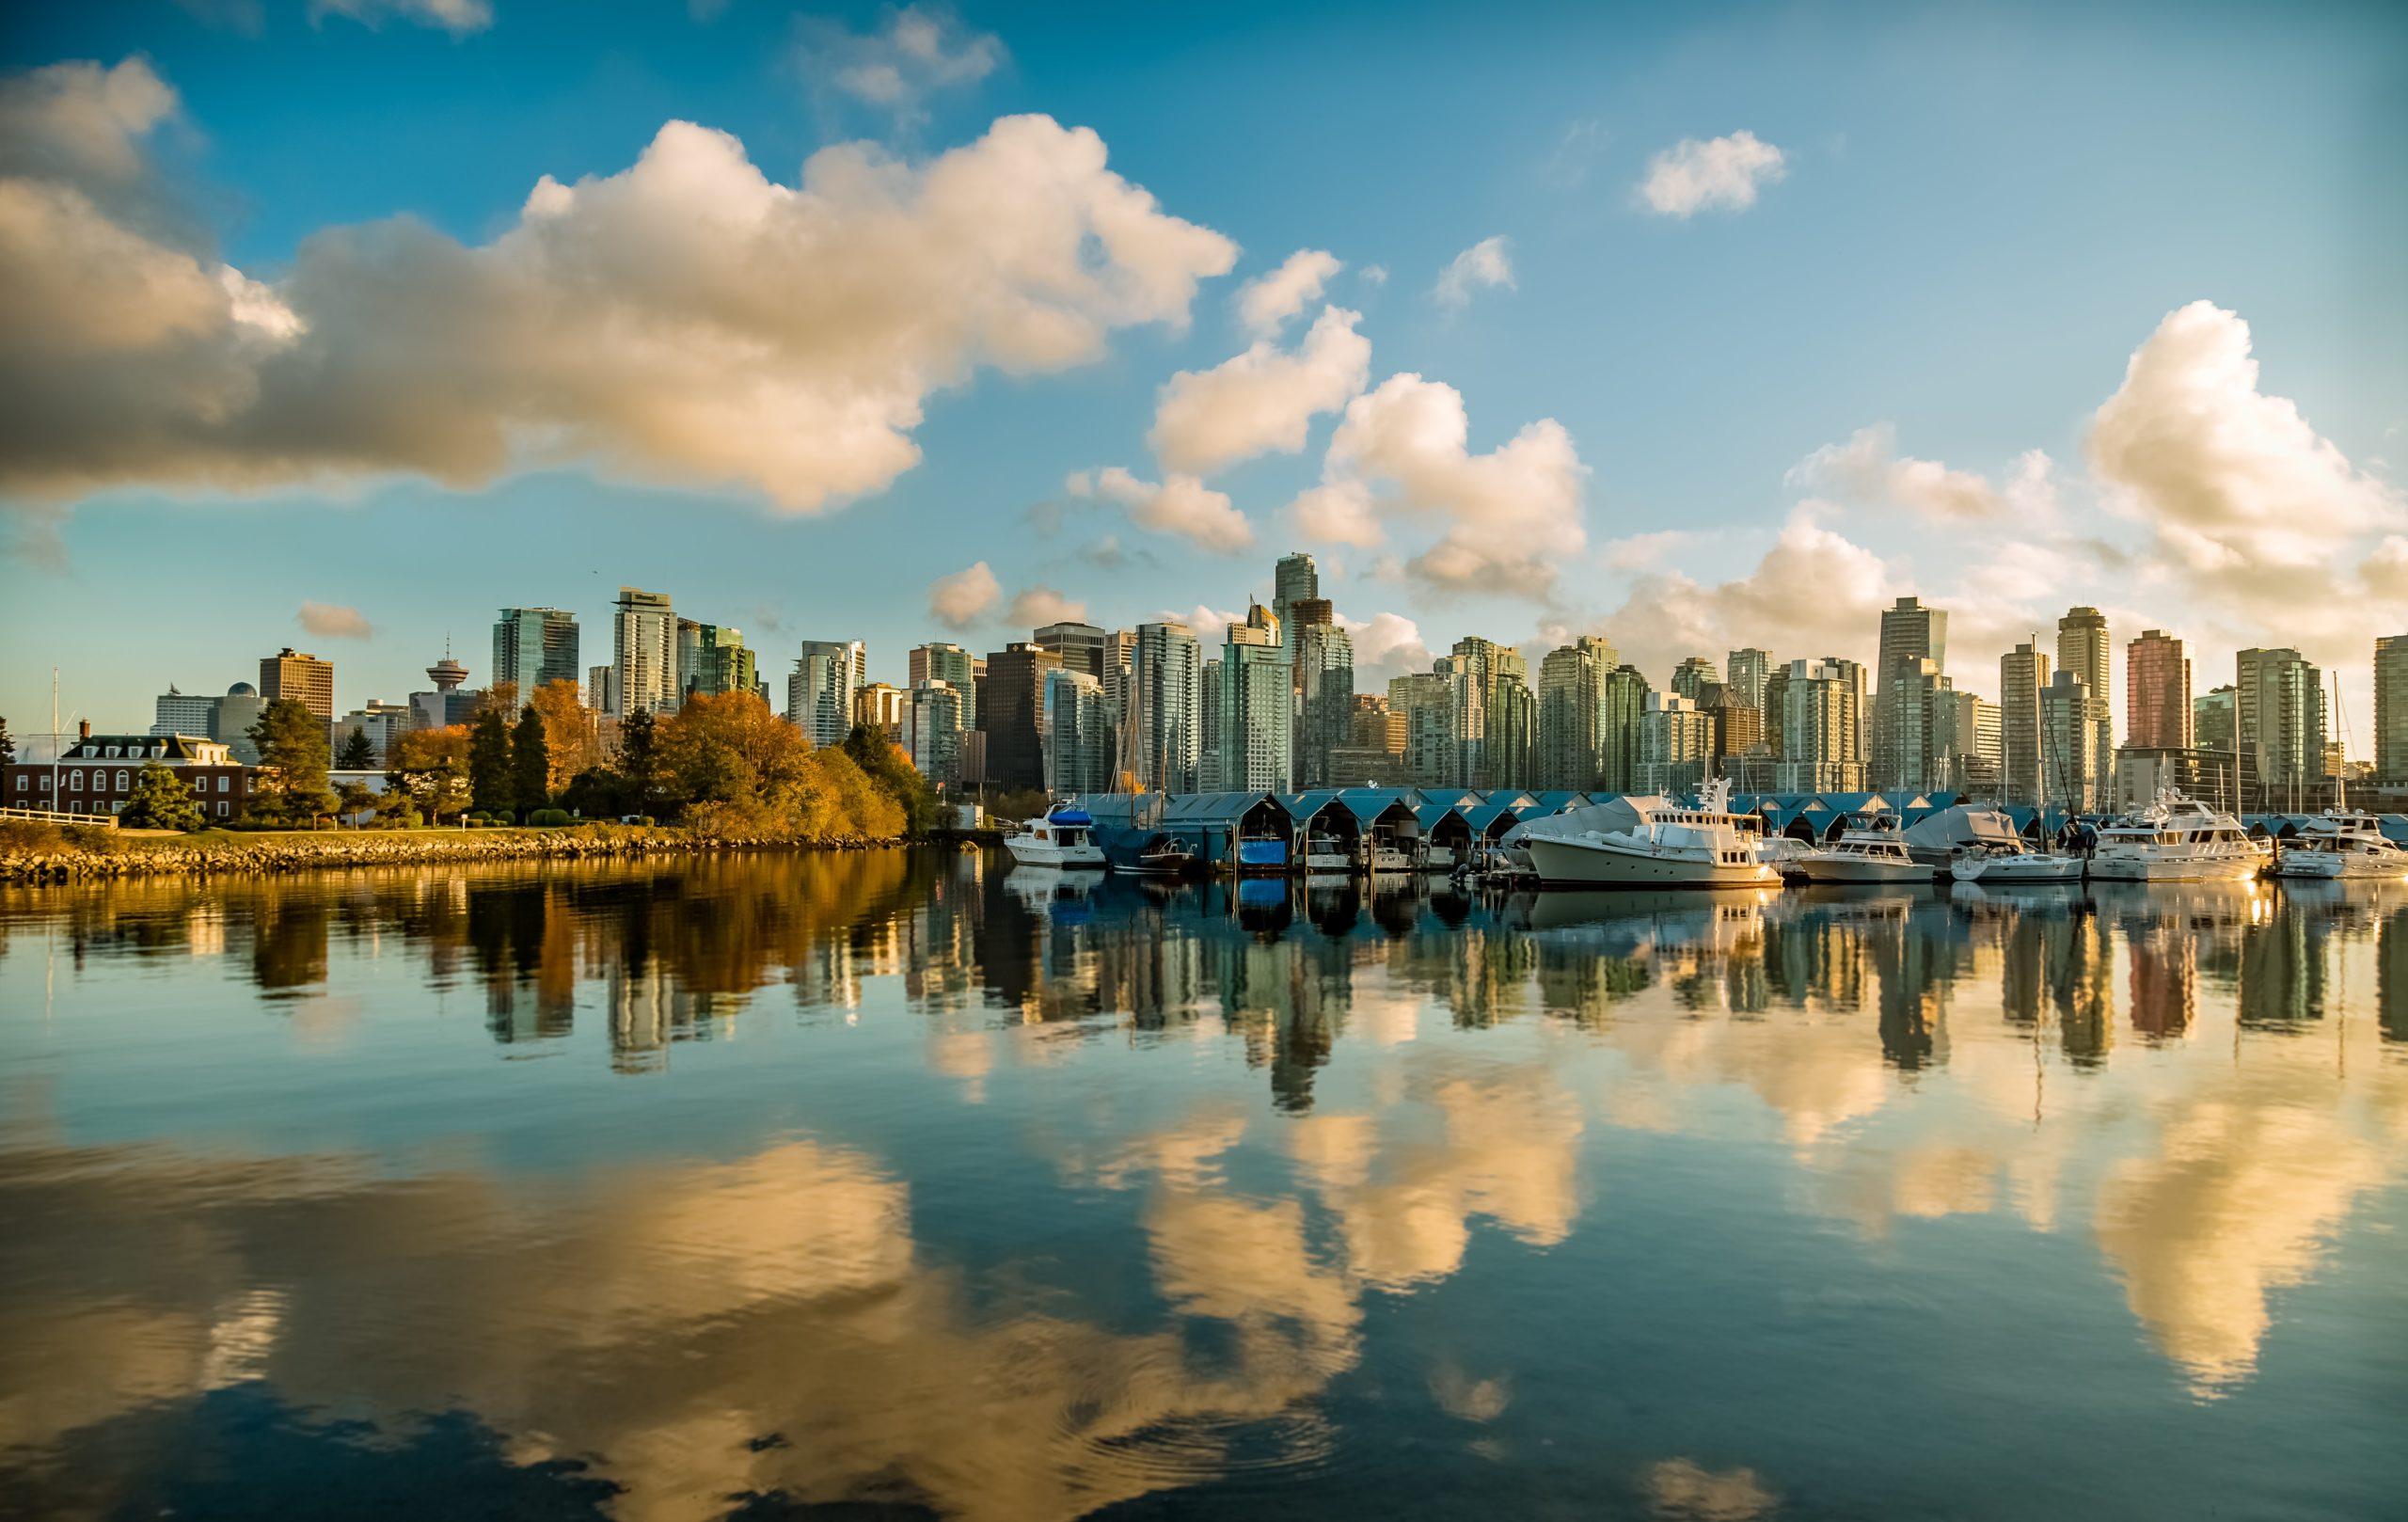 Auslandspraktikum in Vancouver